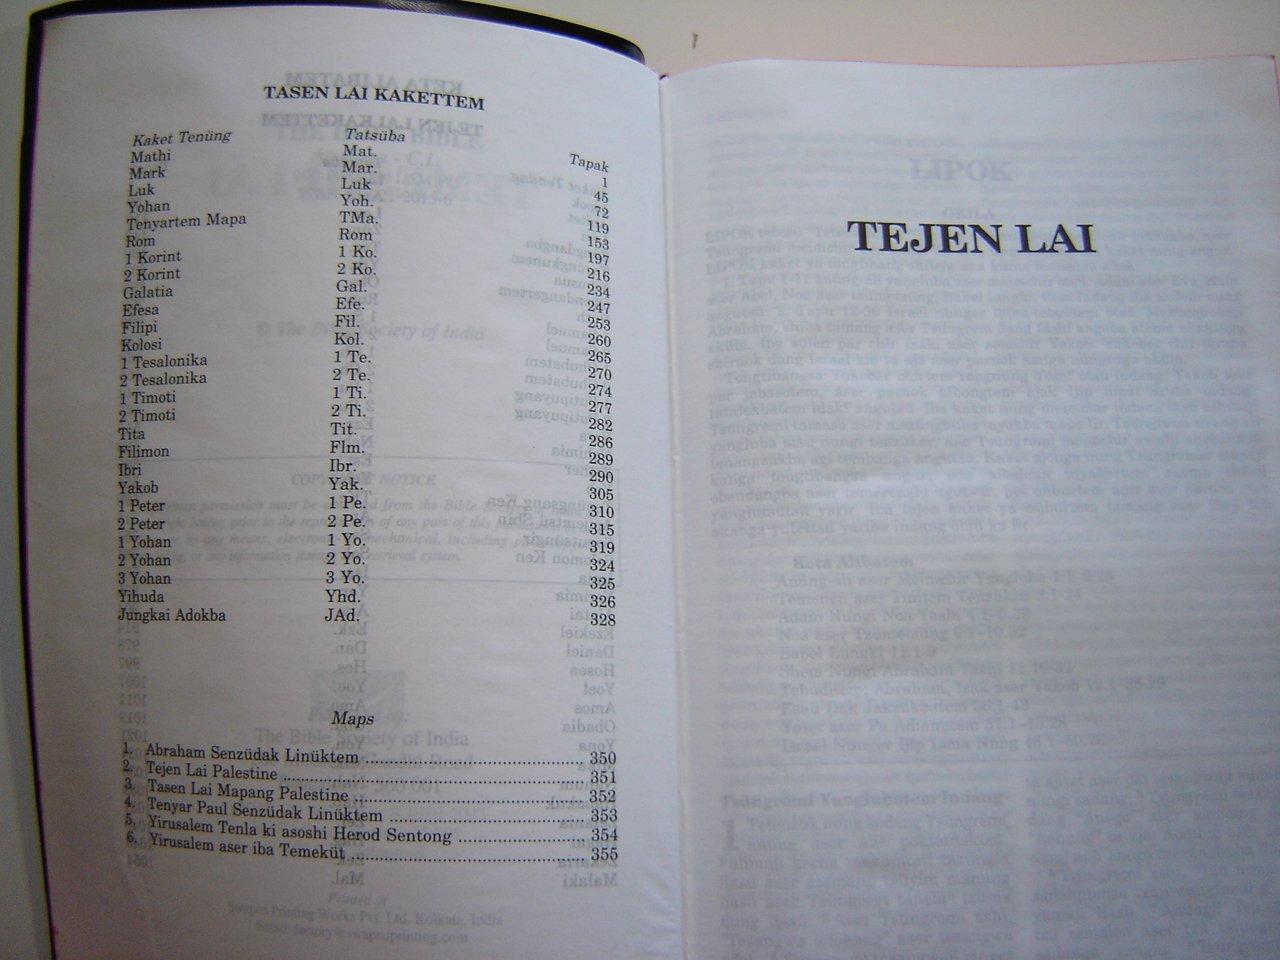 Ao Naga Language Bible / TEMESHI LAI - Tejen Lai - Tasen Lai / C.L.Vinyl Bound / Mongsen Ao is a Tibeto-Burman language spoken by the Ao of Nagaland in ...